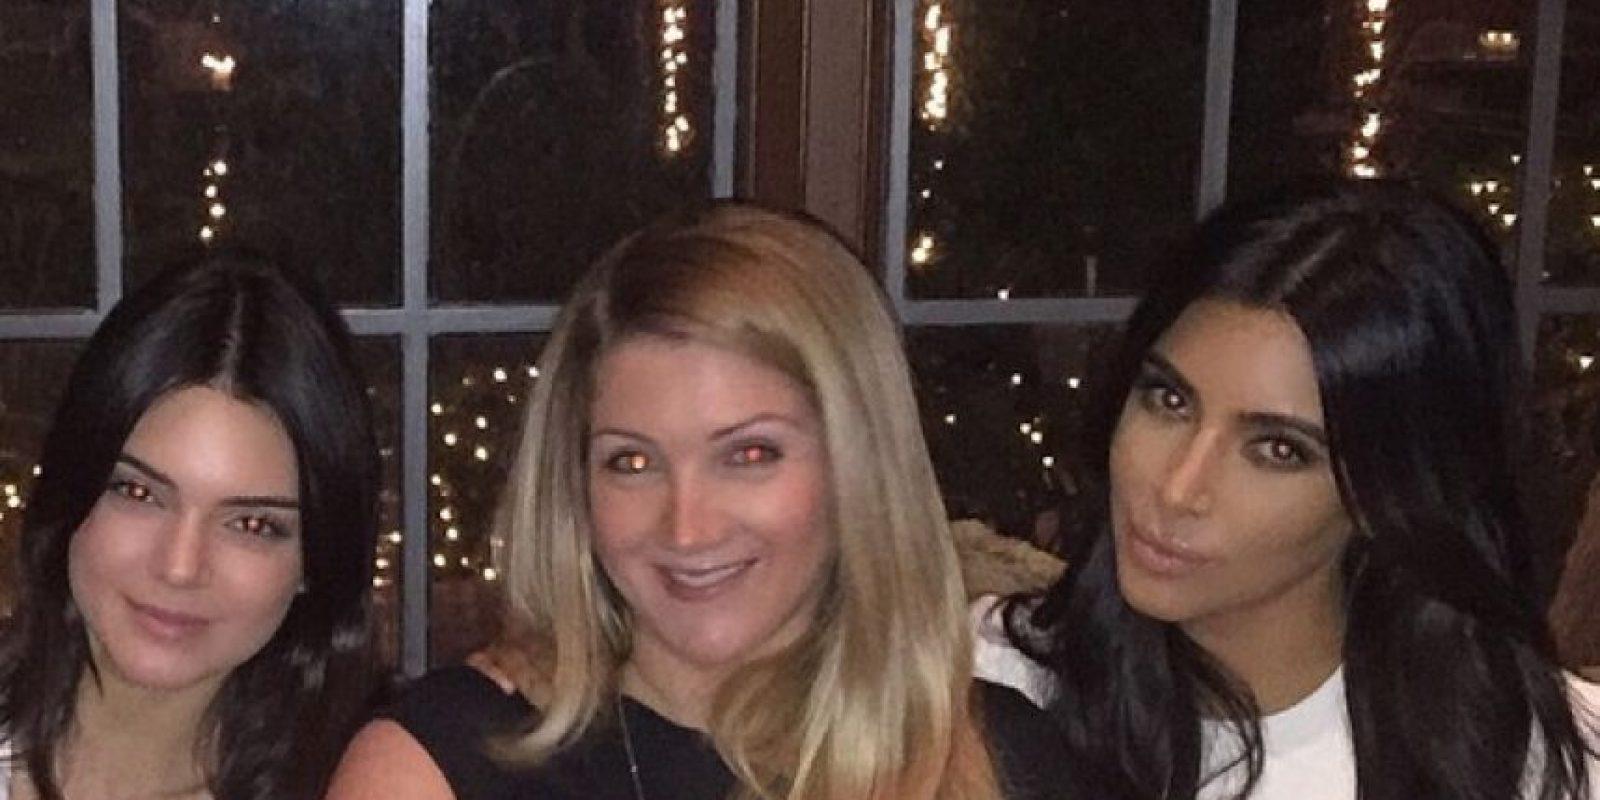 Kendall Jenner, Alison Statter y Kim Kardashian Foto:Instagram @kimkardashian